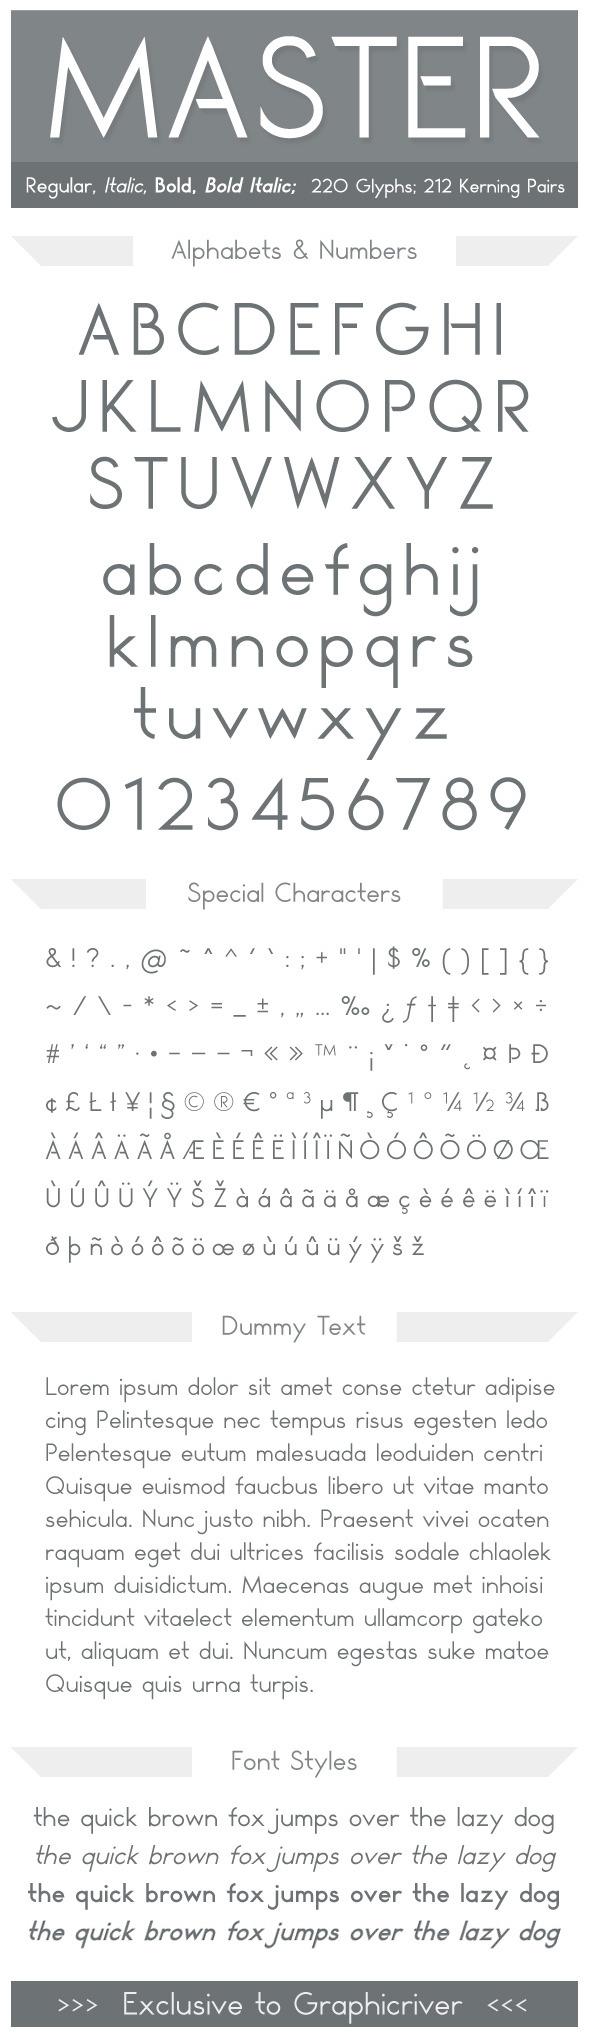 Master - Fonts